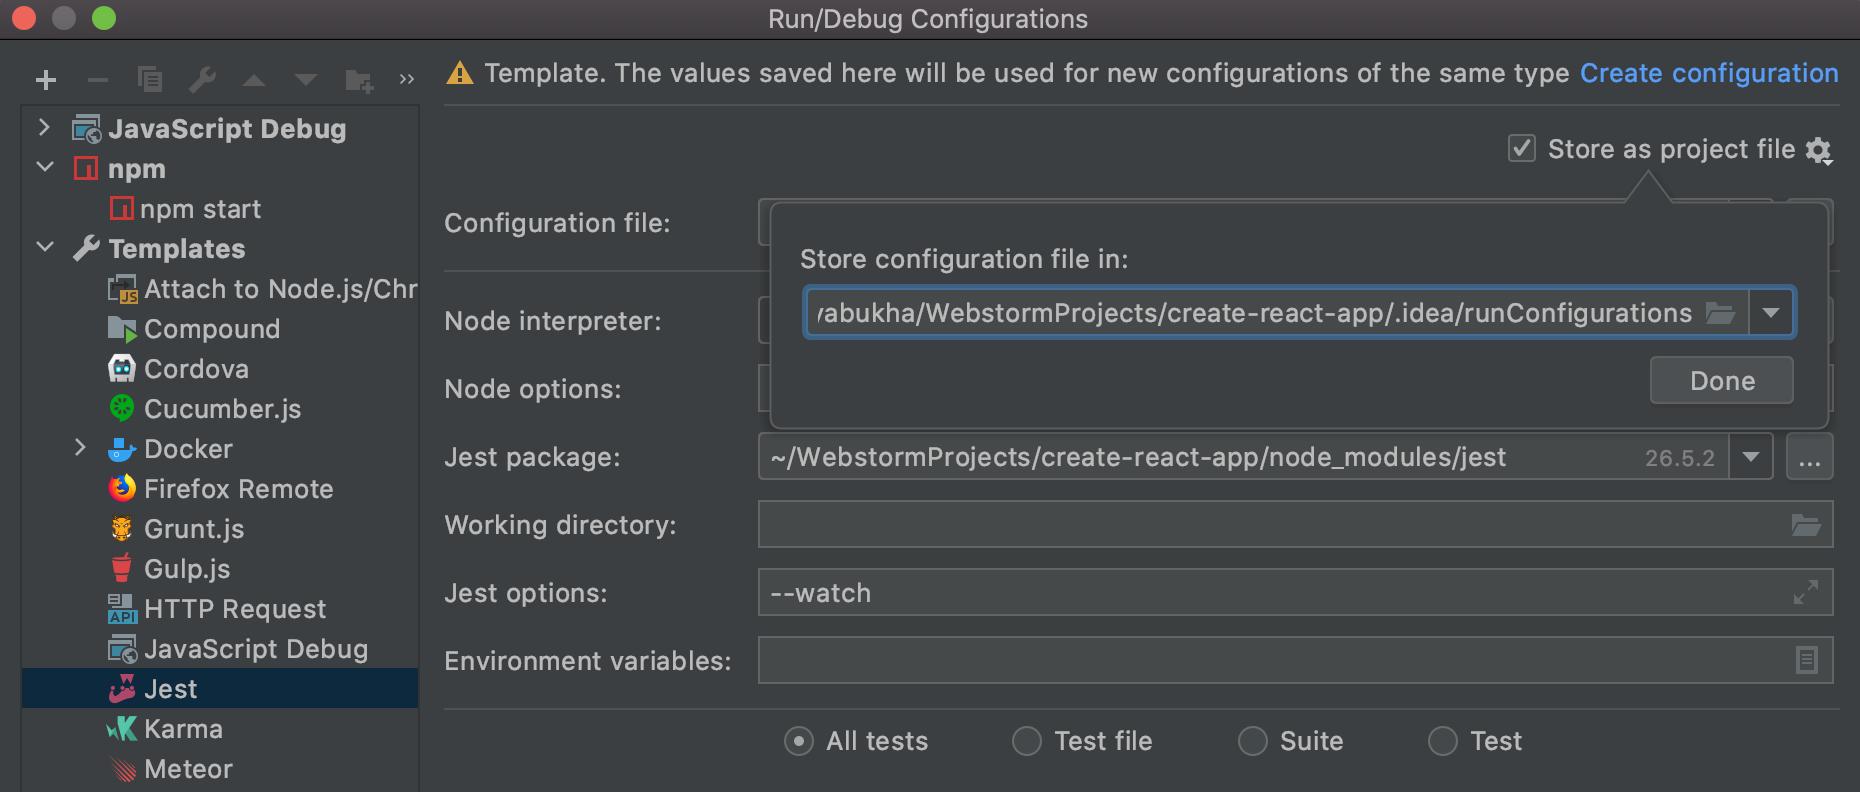 store-run-configuration-templates-as-files